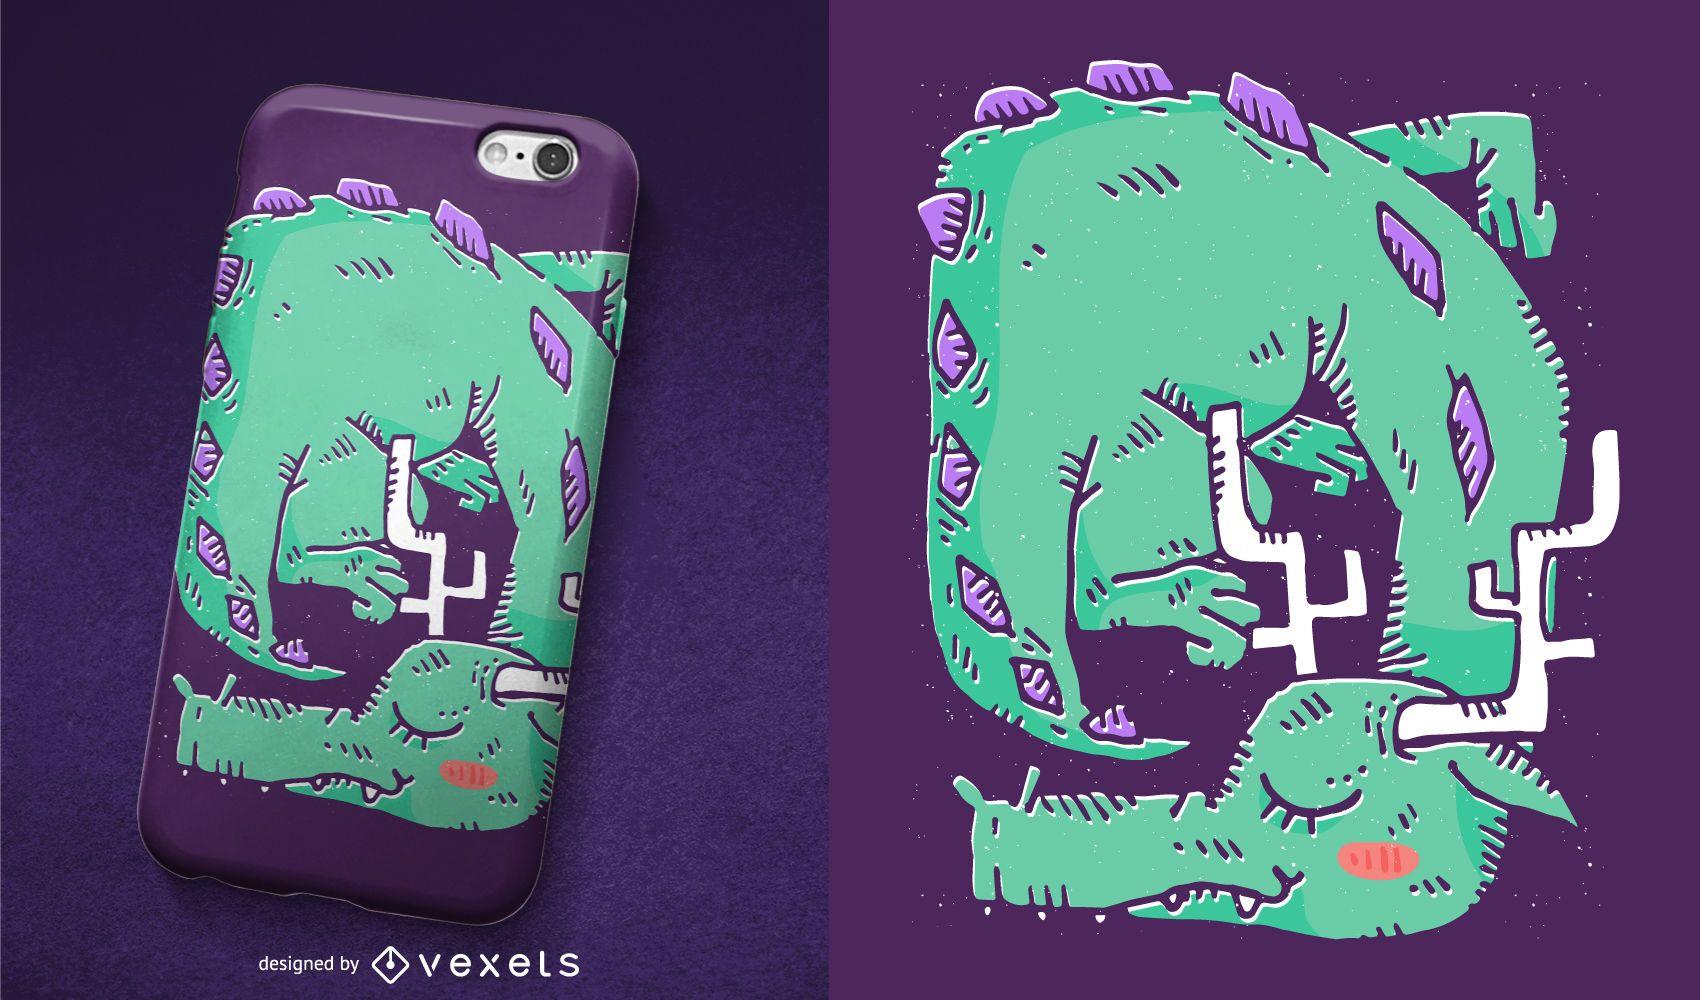 Sleeping dragon phone case design